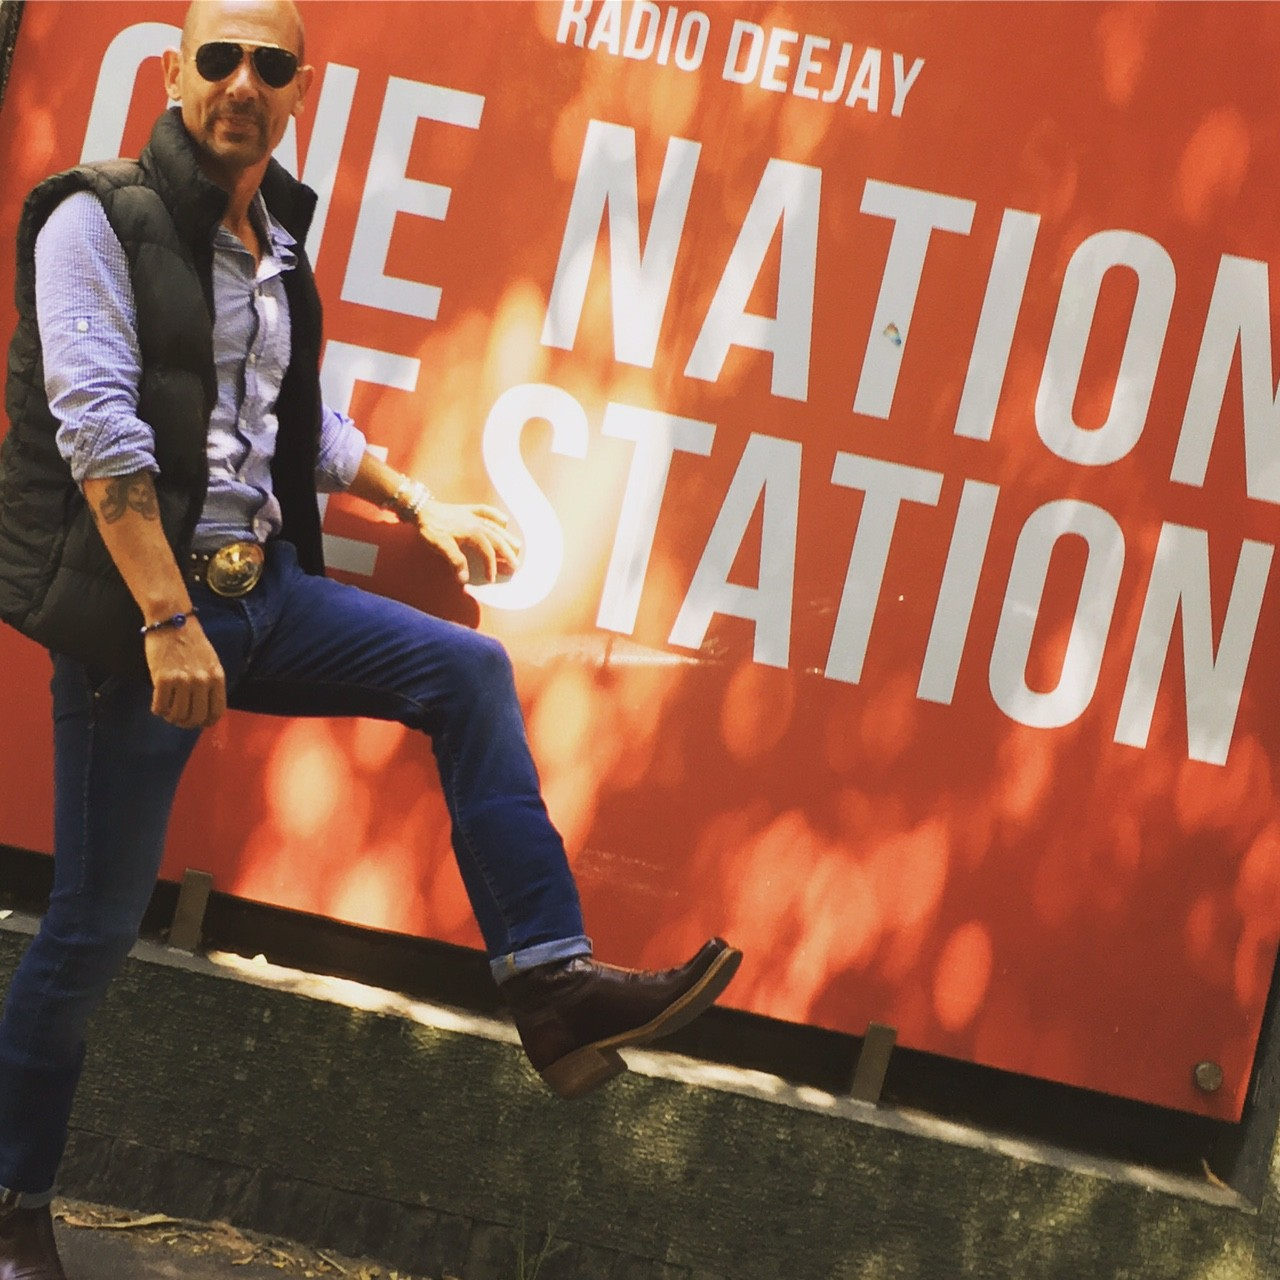 Mat a Radio Deejay